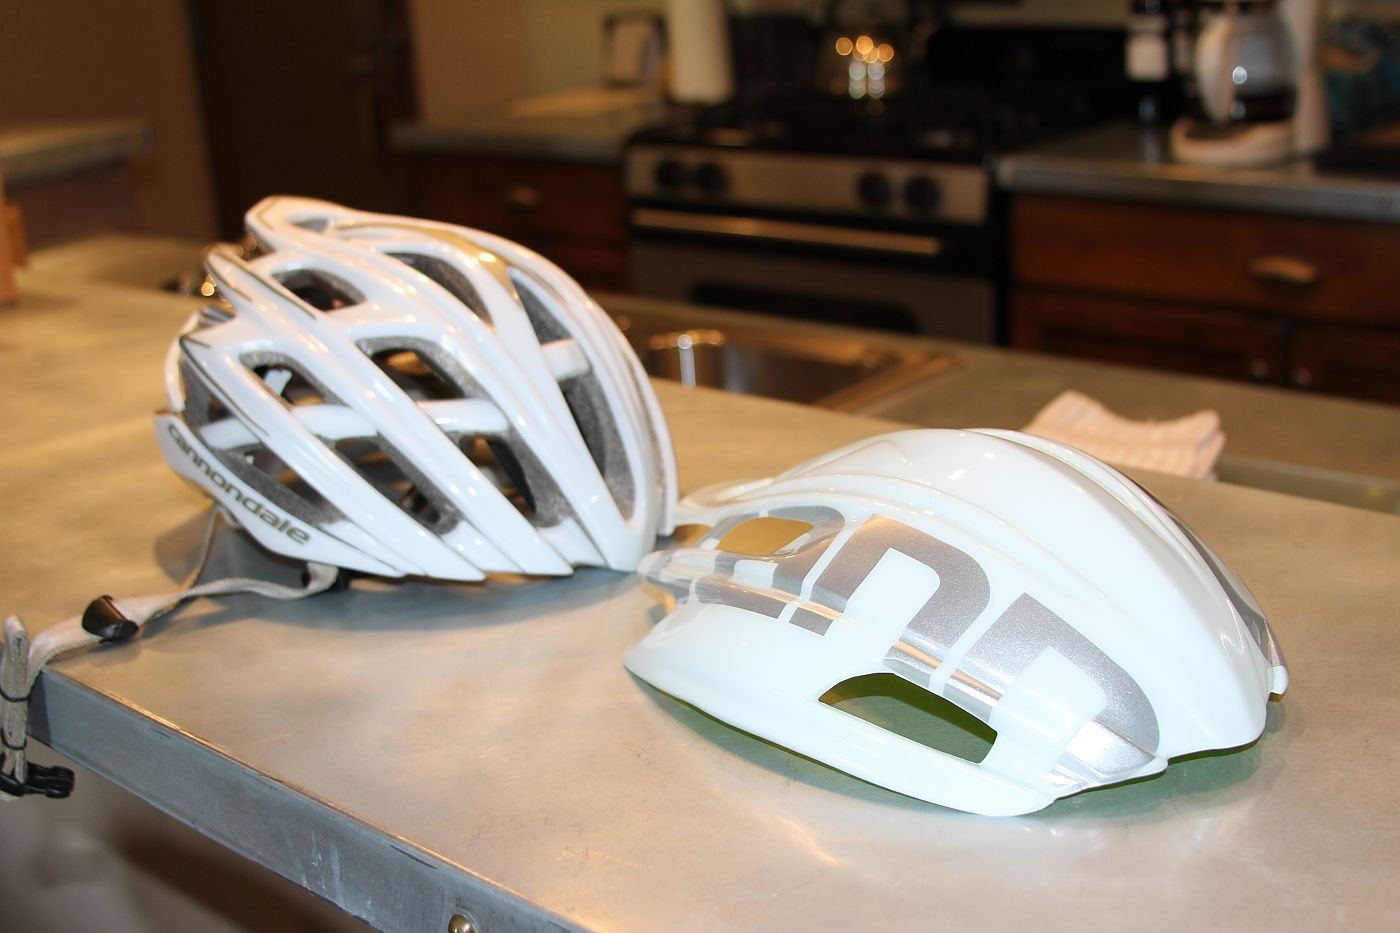 Biking helmet shell